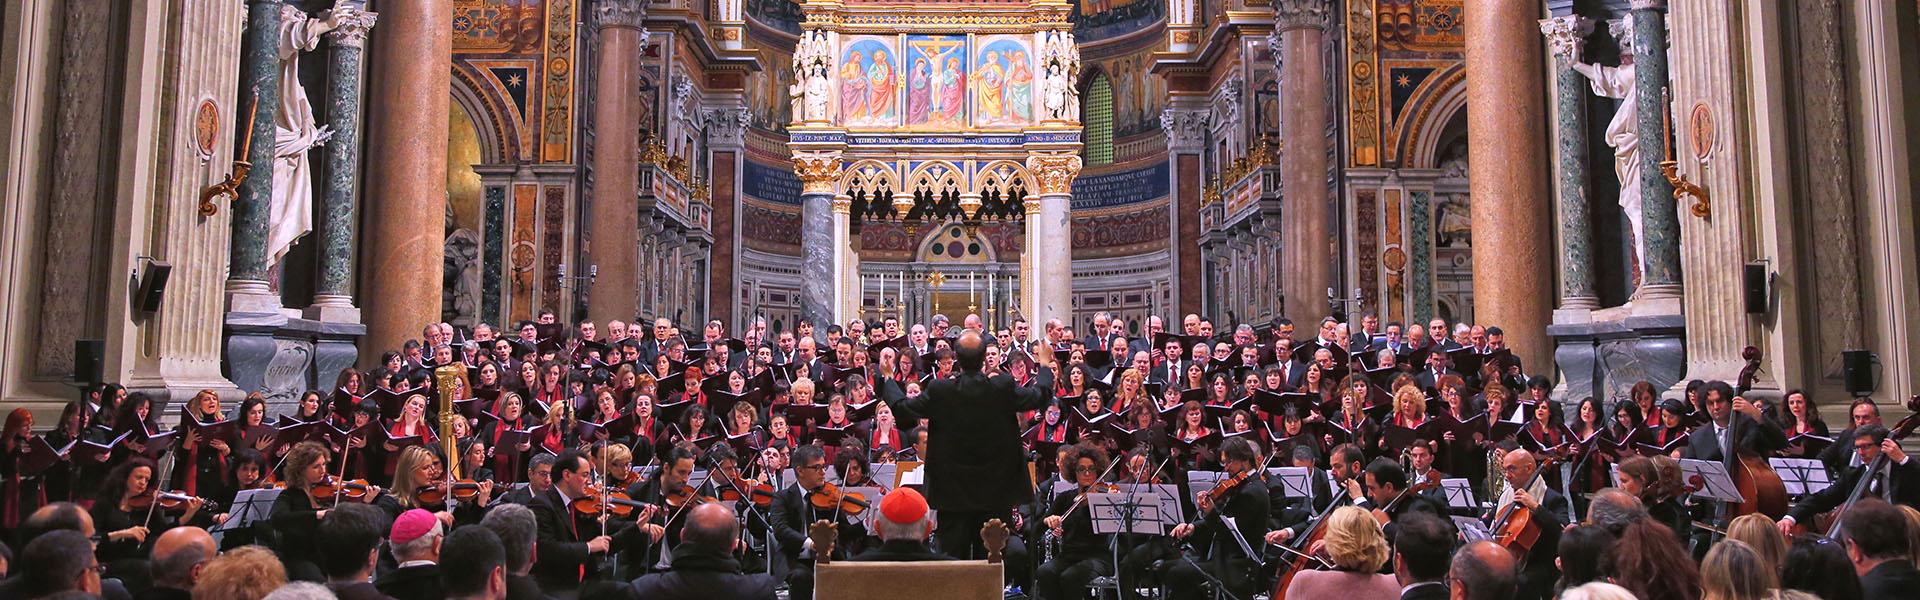 Choeur du diocèse de Rome, http://www.corodiocesidiroma.com/